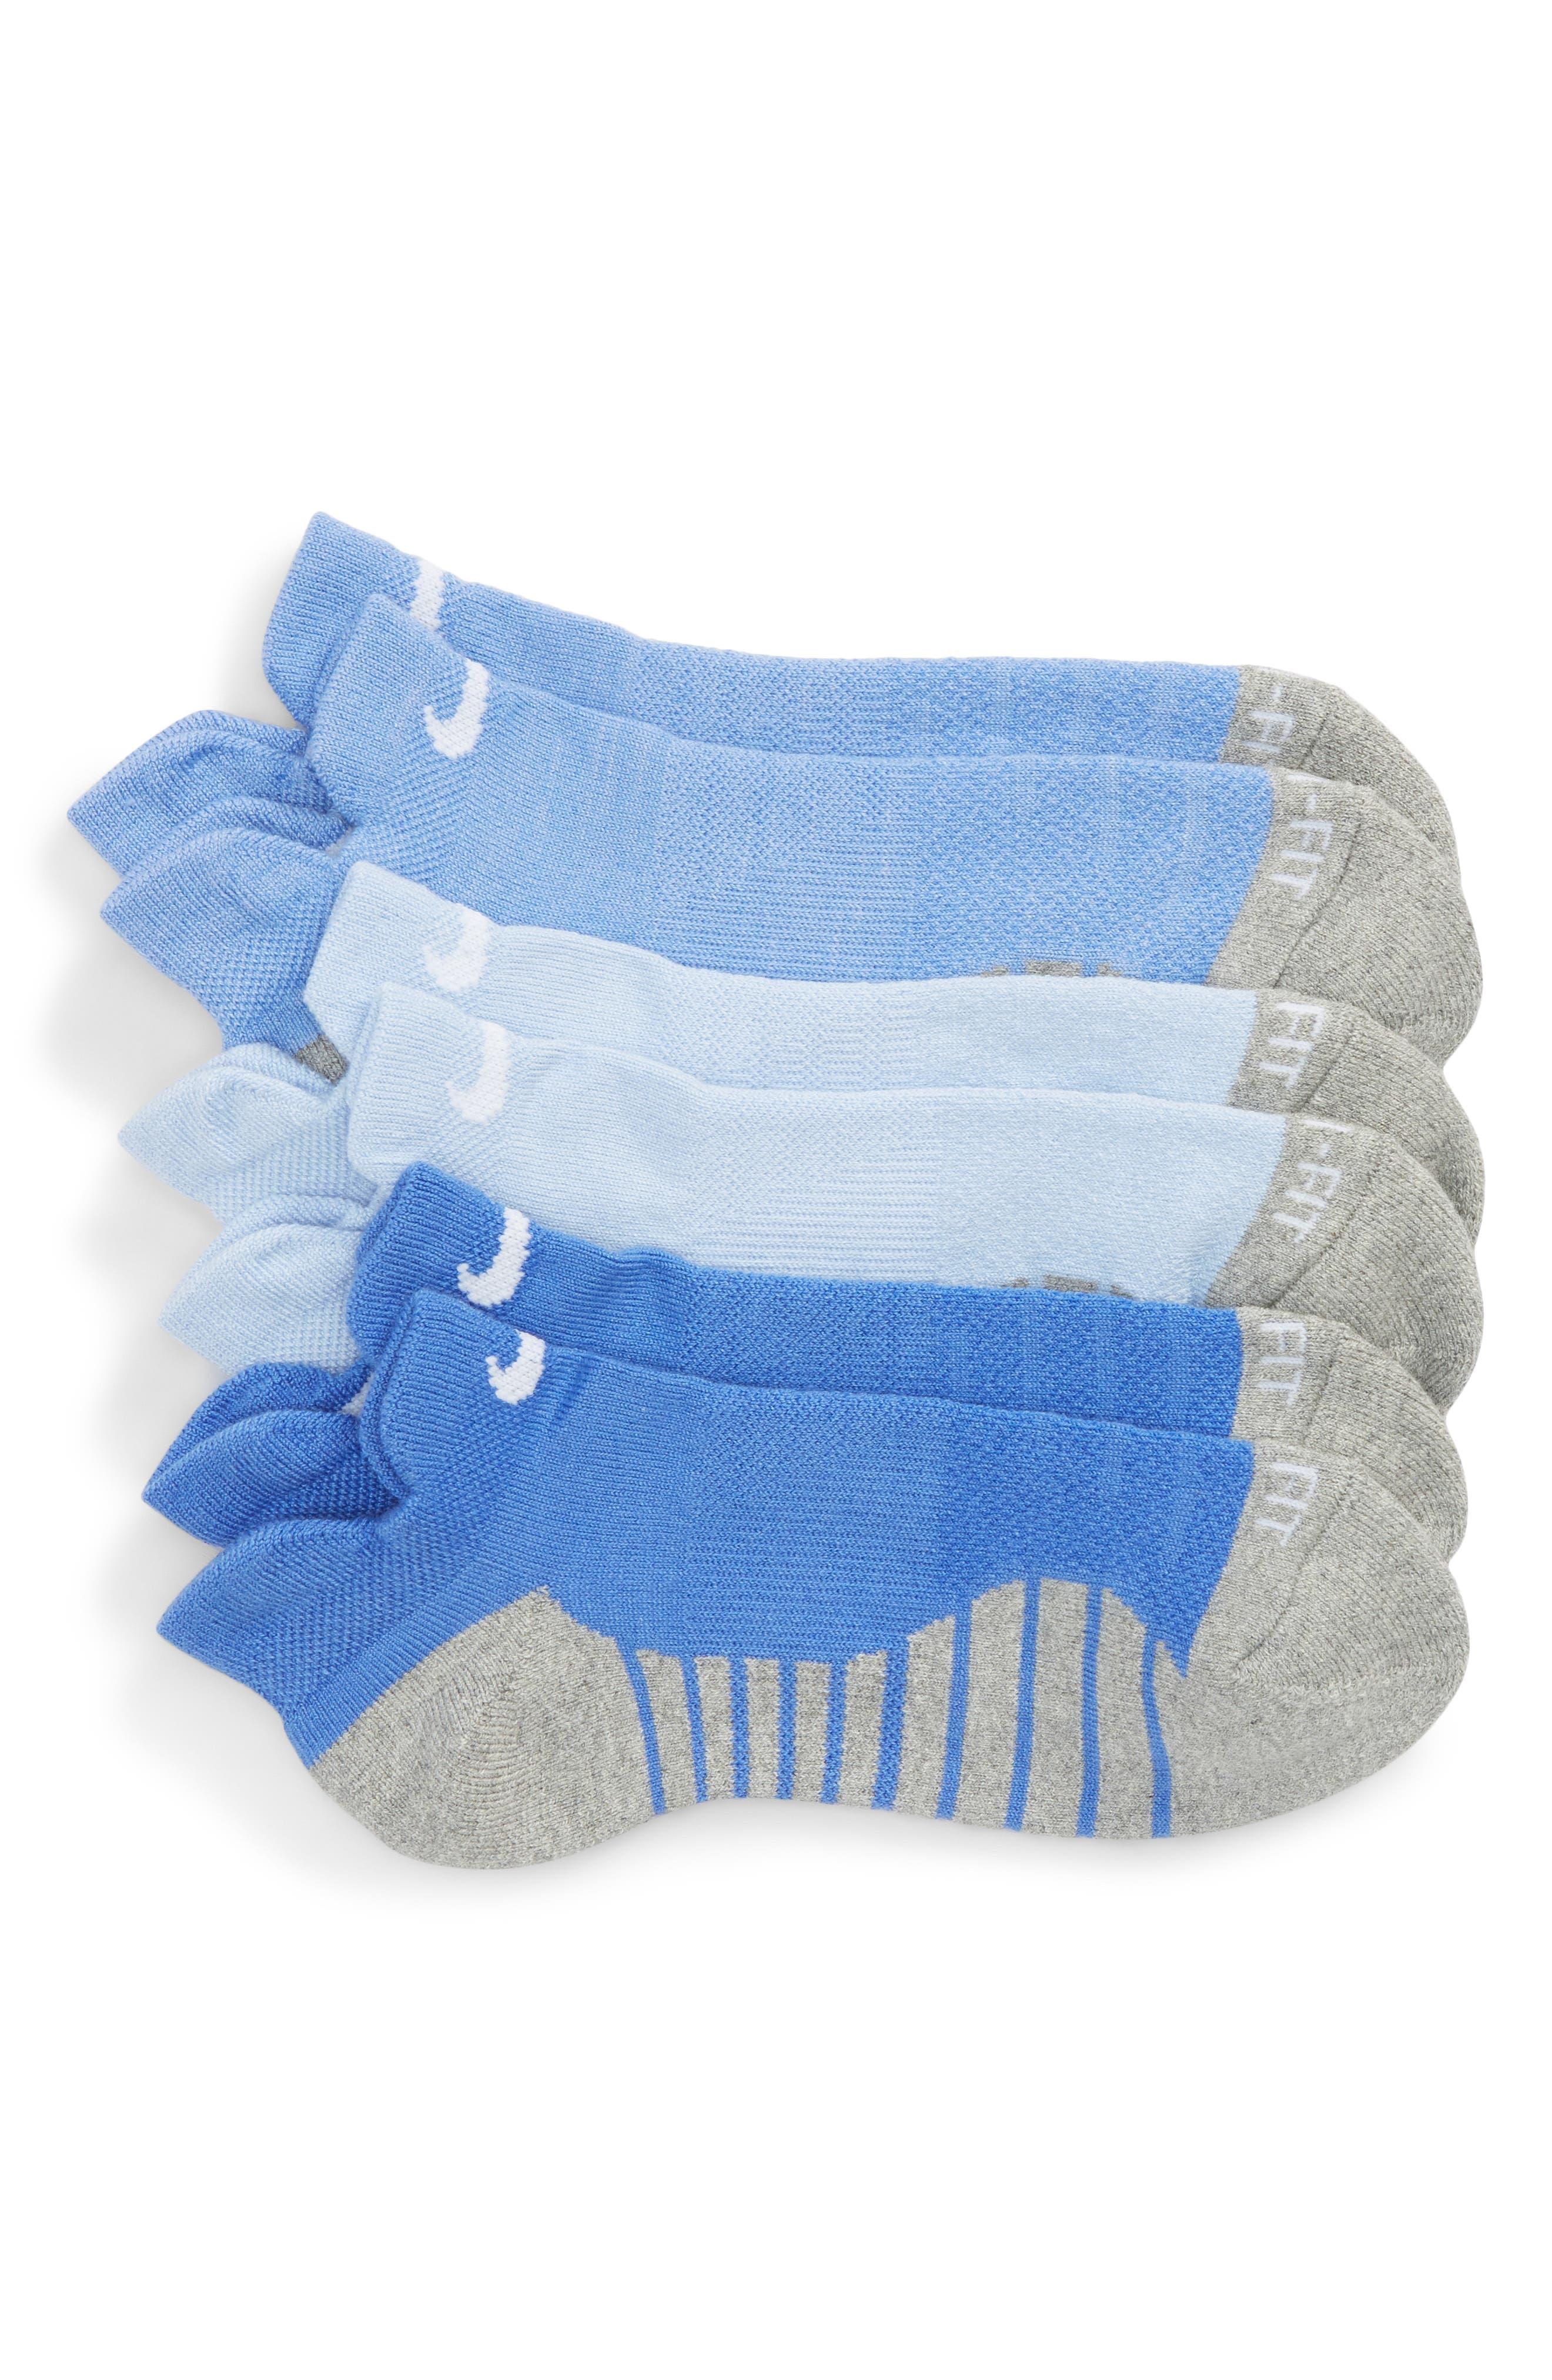 Main Image - Nike Dry 3-Pack Cushioned Low Cut Socks